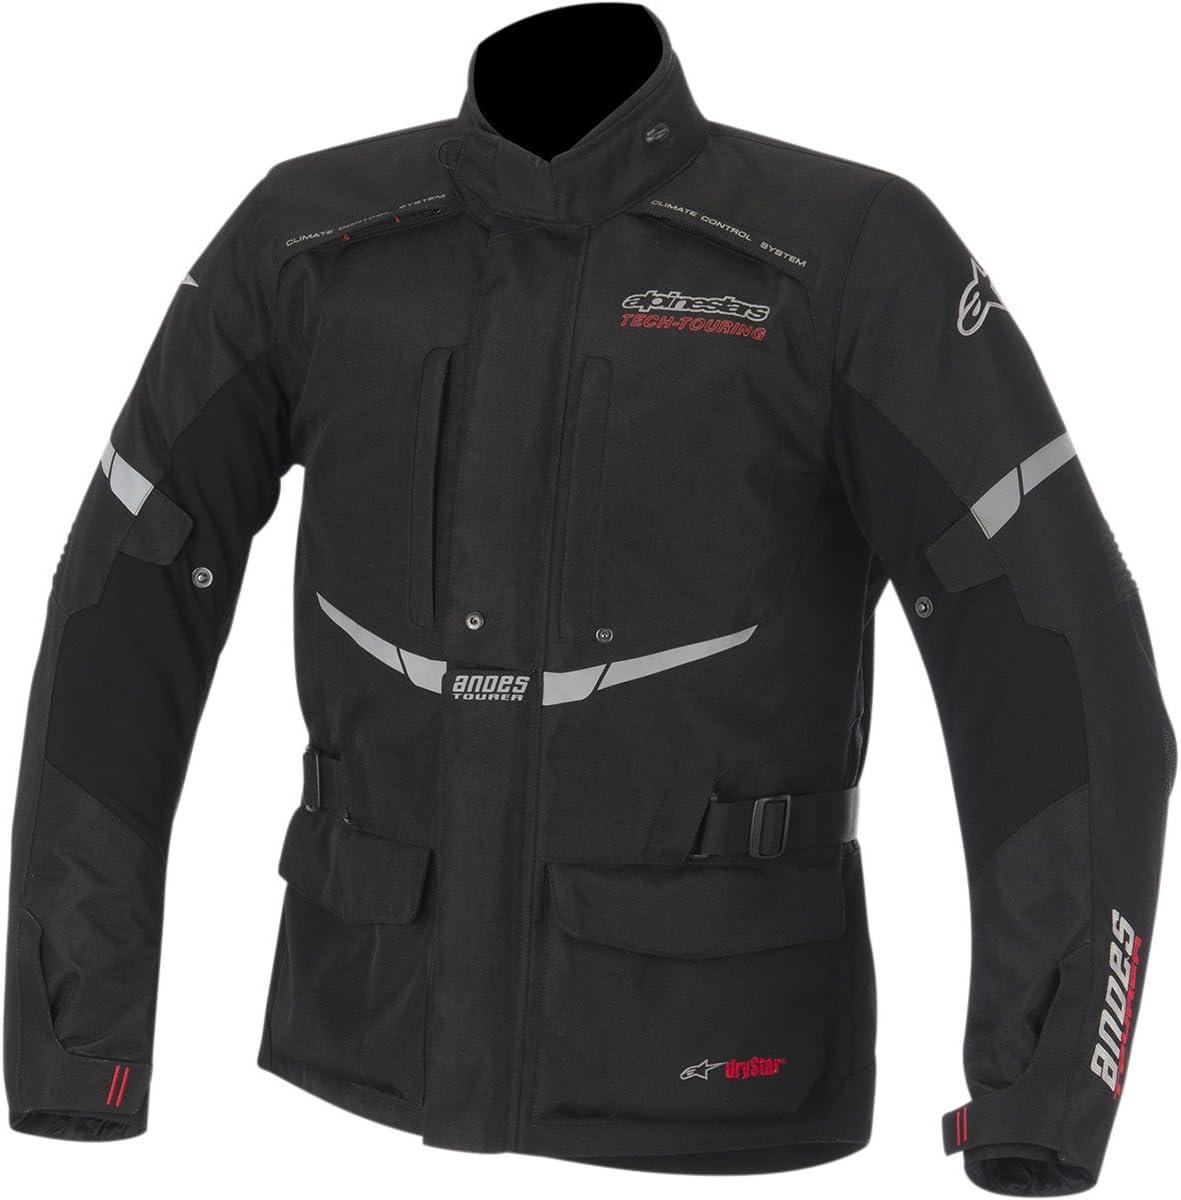 Veste de moto imperm/éable et respirante Alpinestars Andes dryStar S Grigio chiaro nero